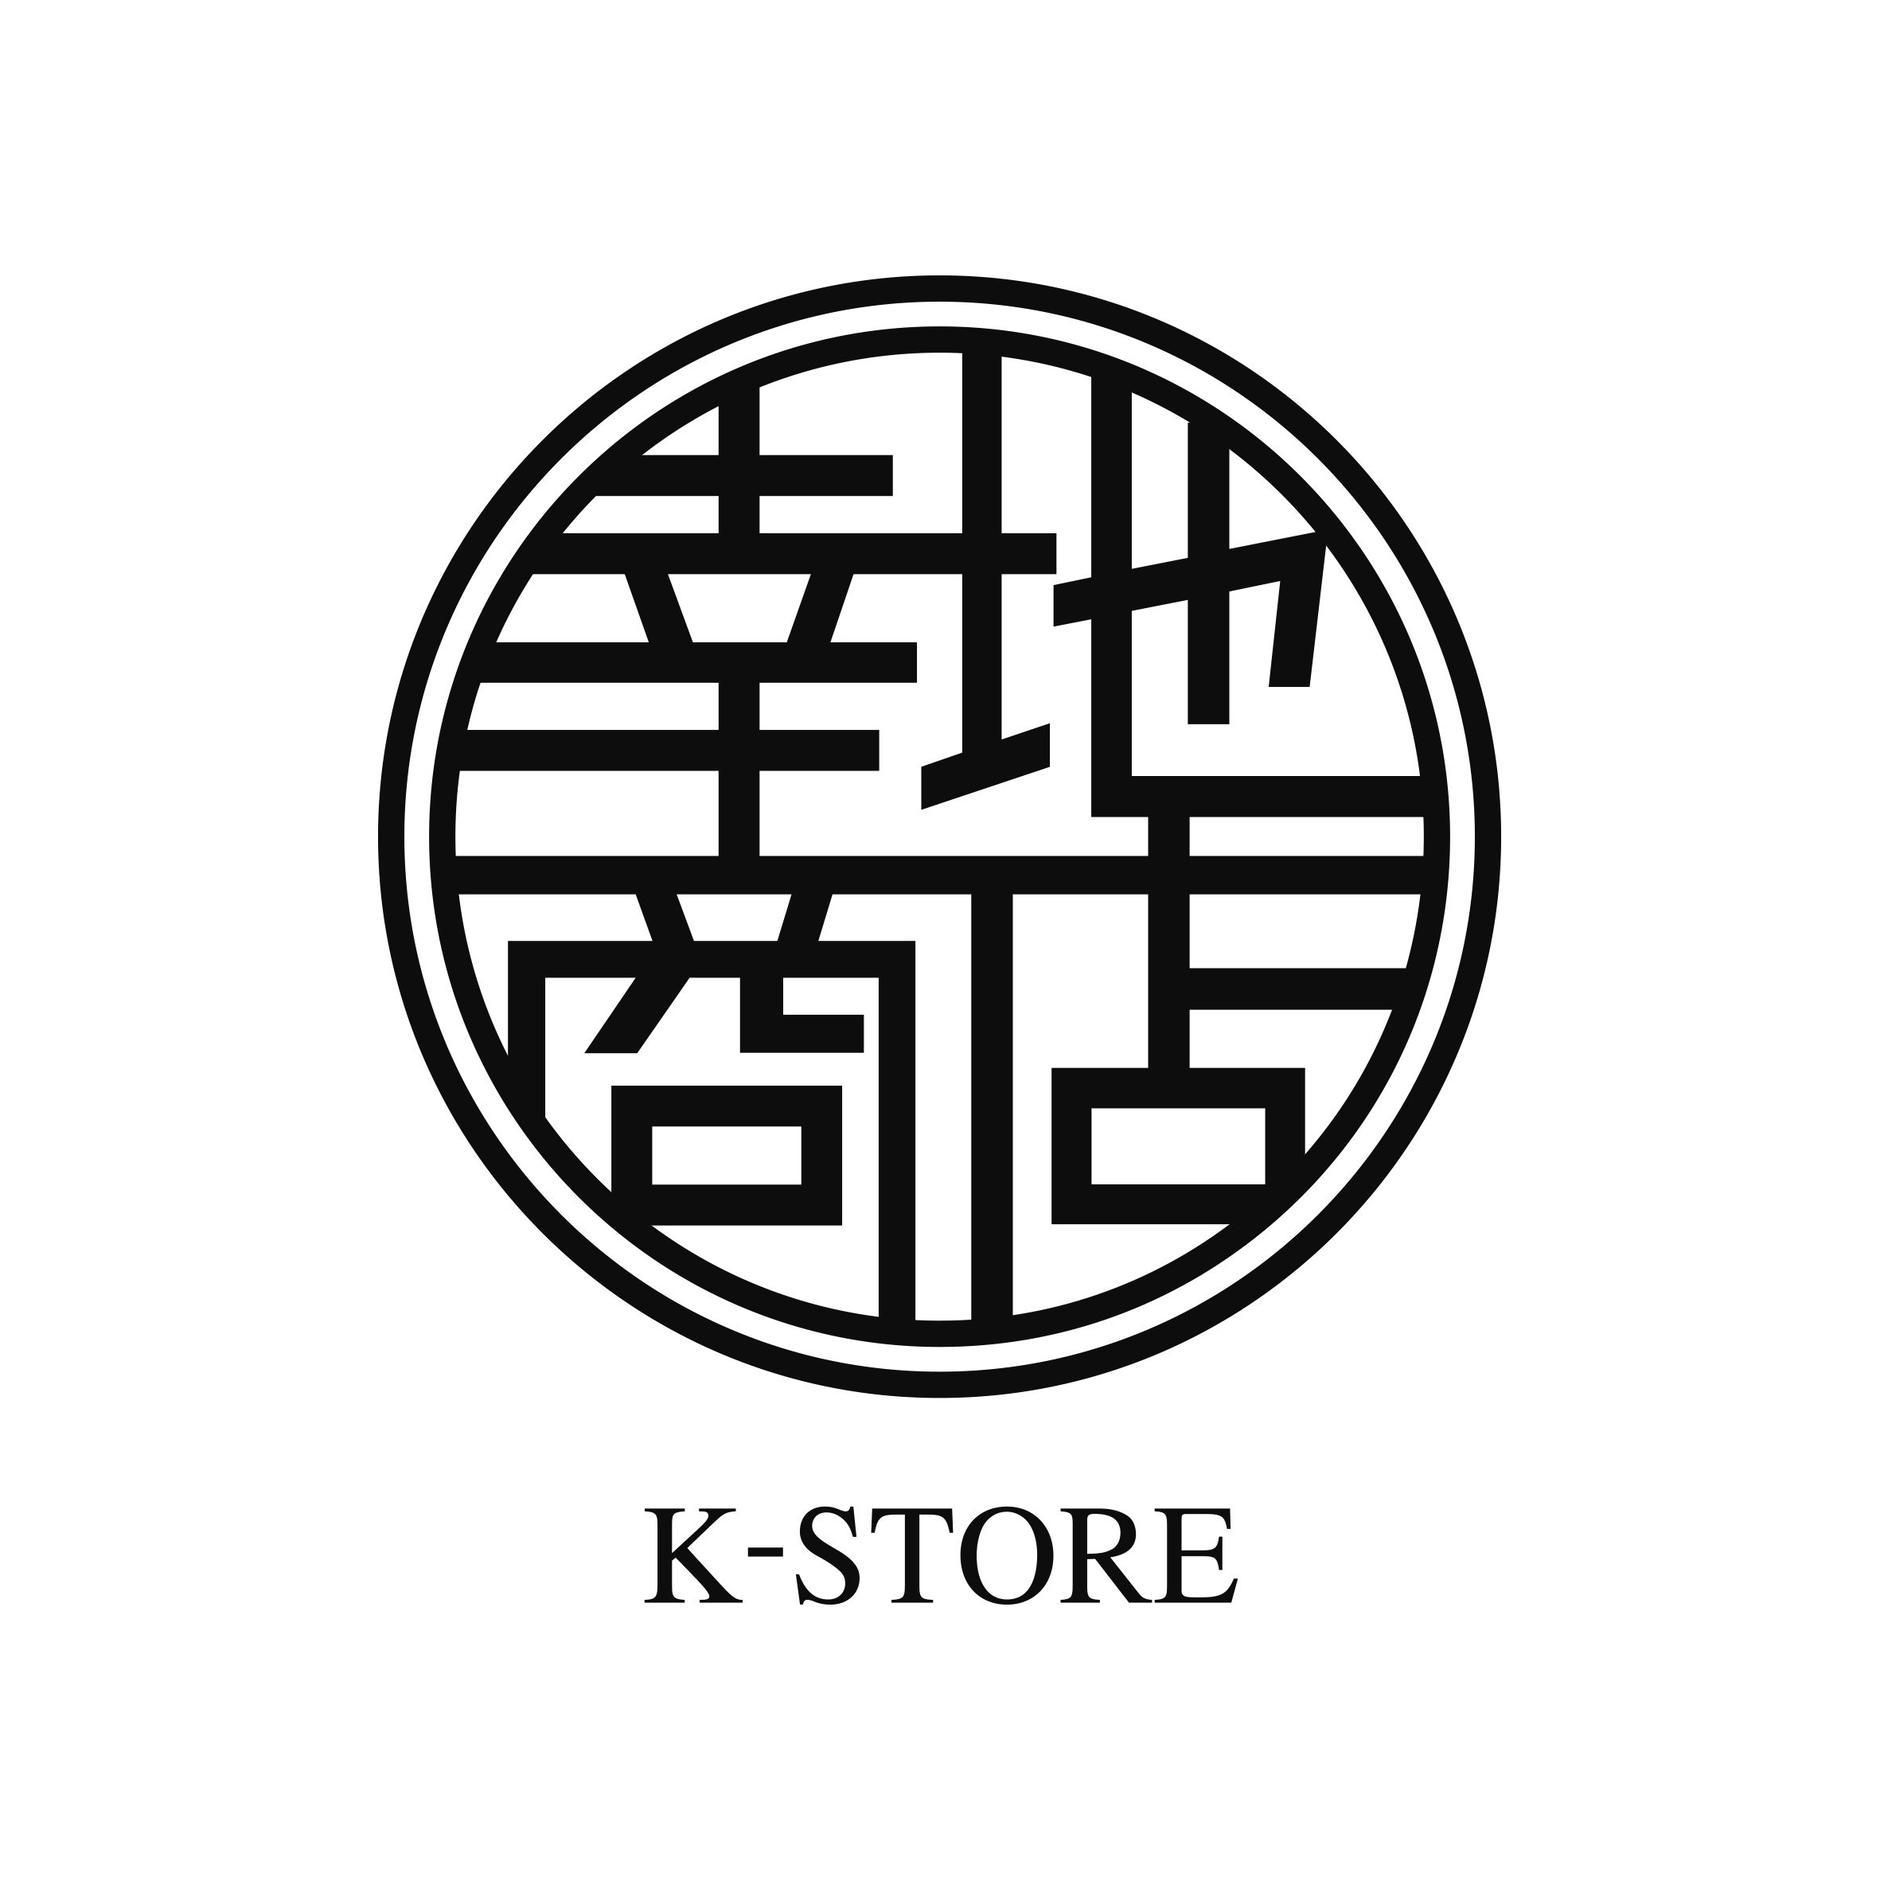 幸地商店 K-STORE